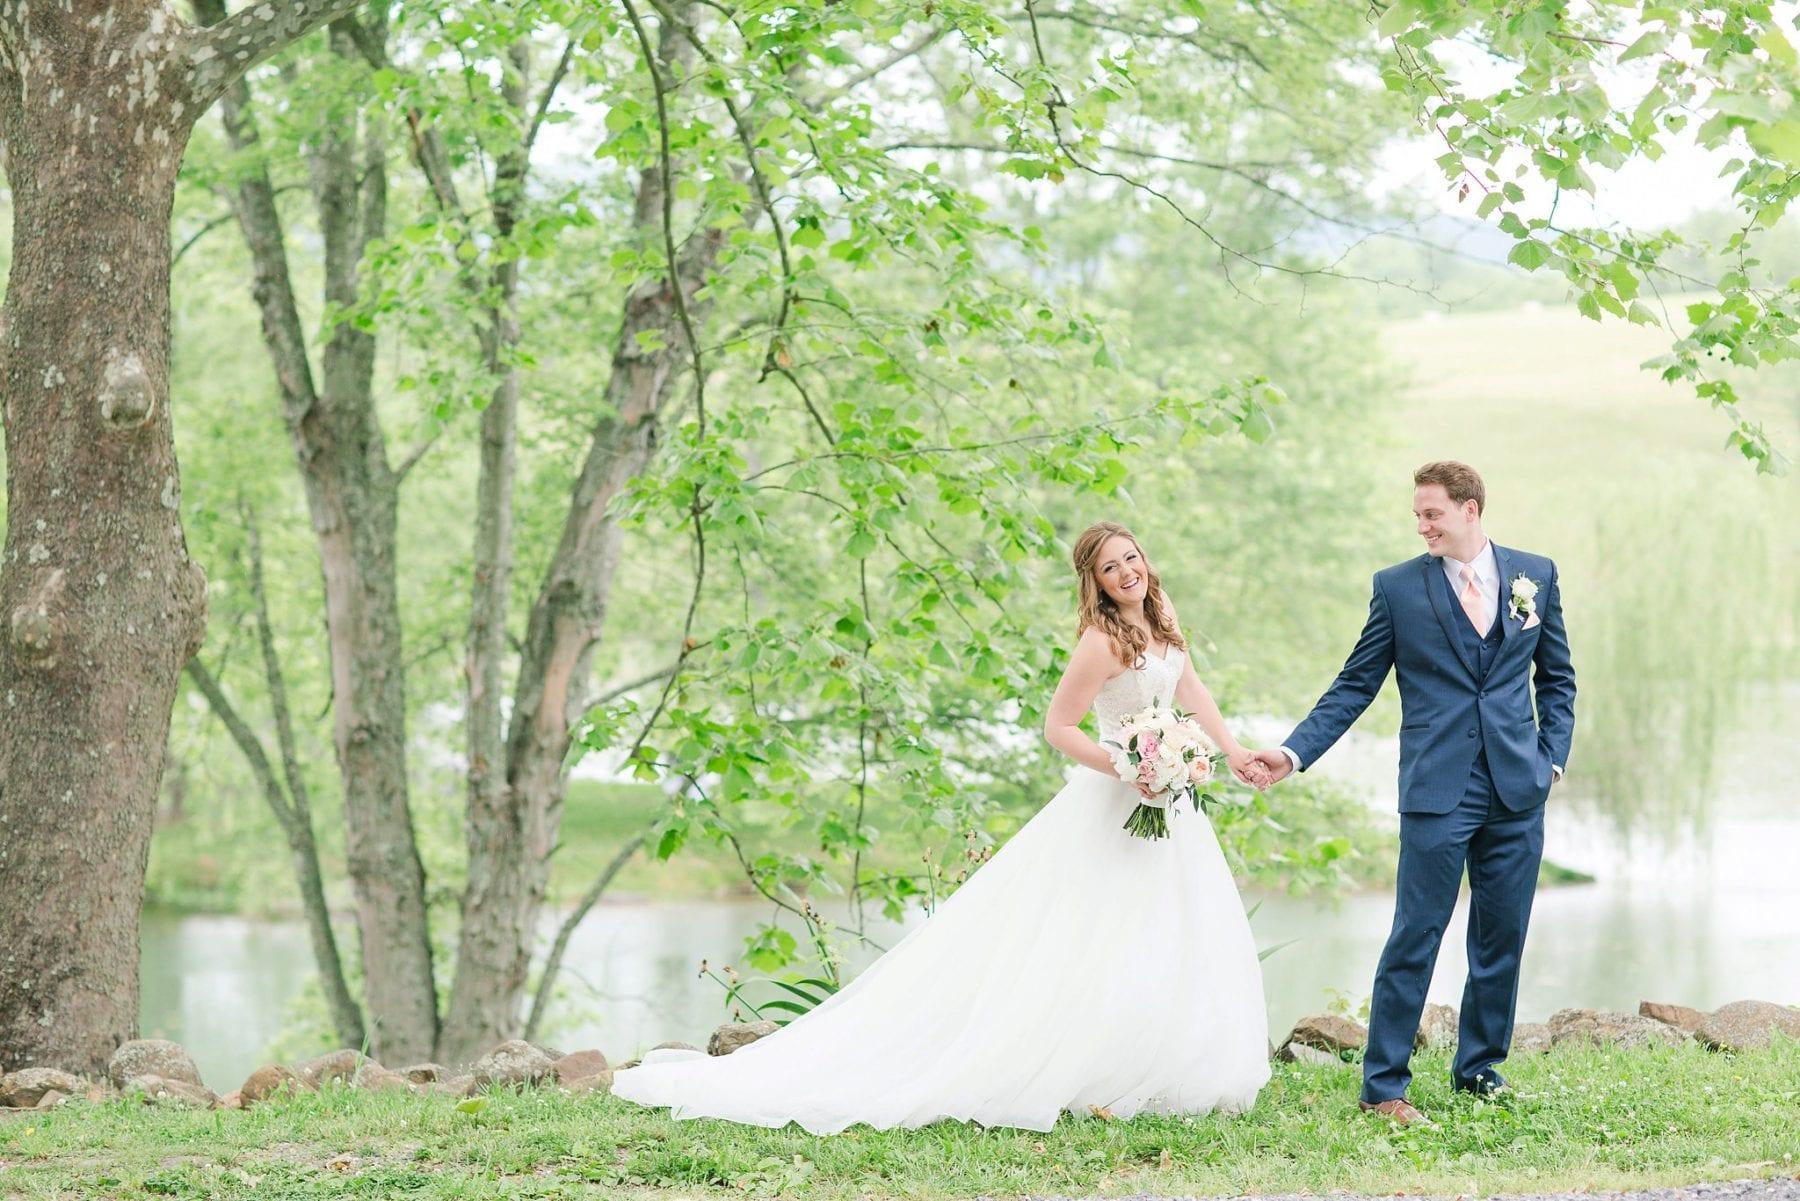 Justin & Megan Big Spring Farm Wedding Photos-96.jpg